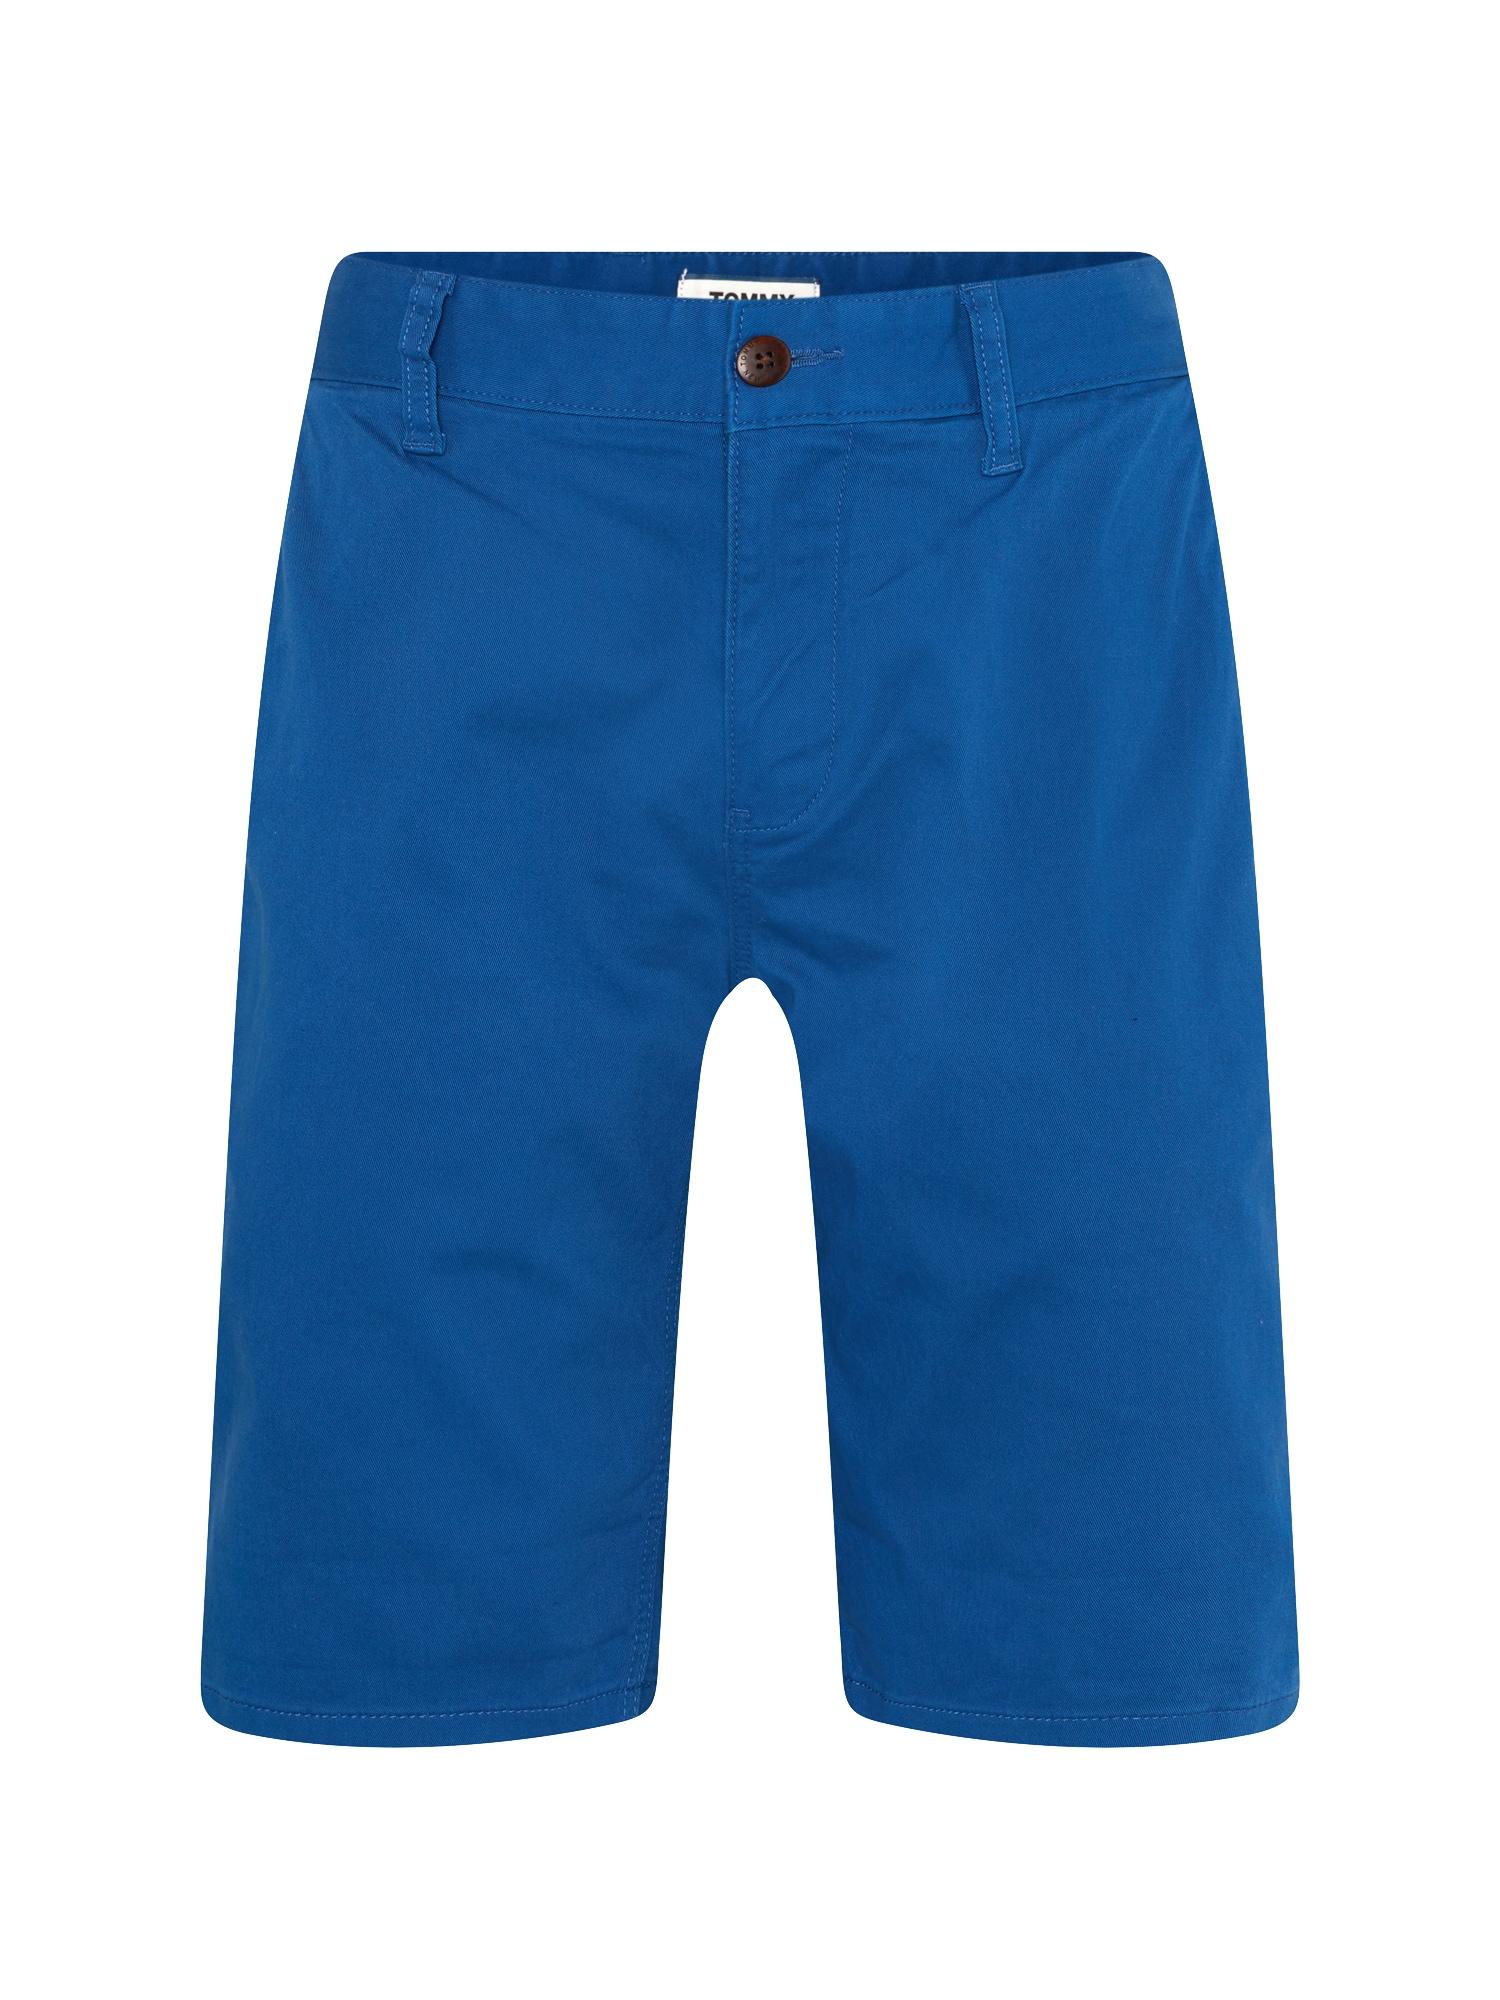 Chino kalhoty TJM ESSENTIAL CHINO SHORT královská modrá Tommy Jeans